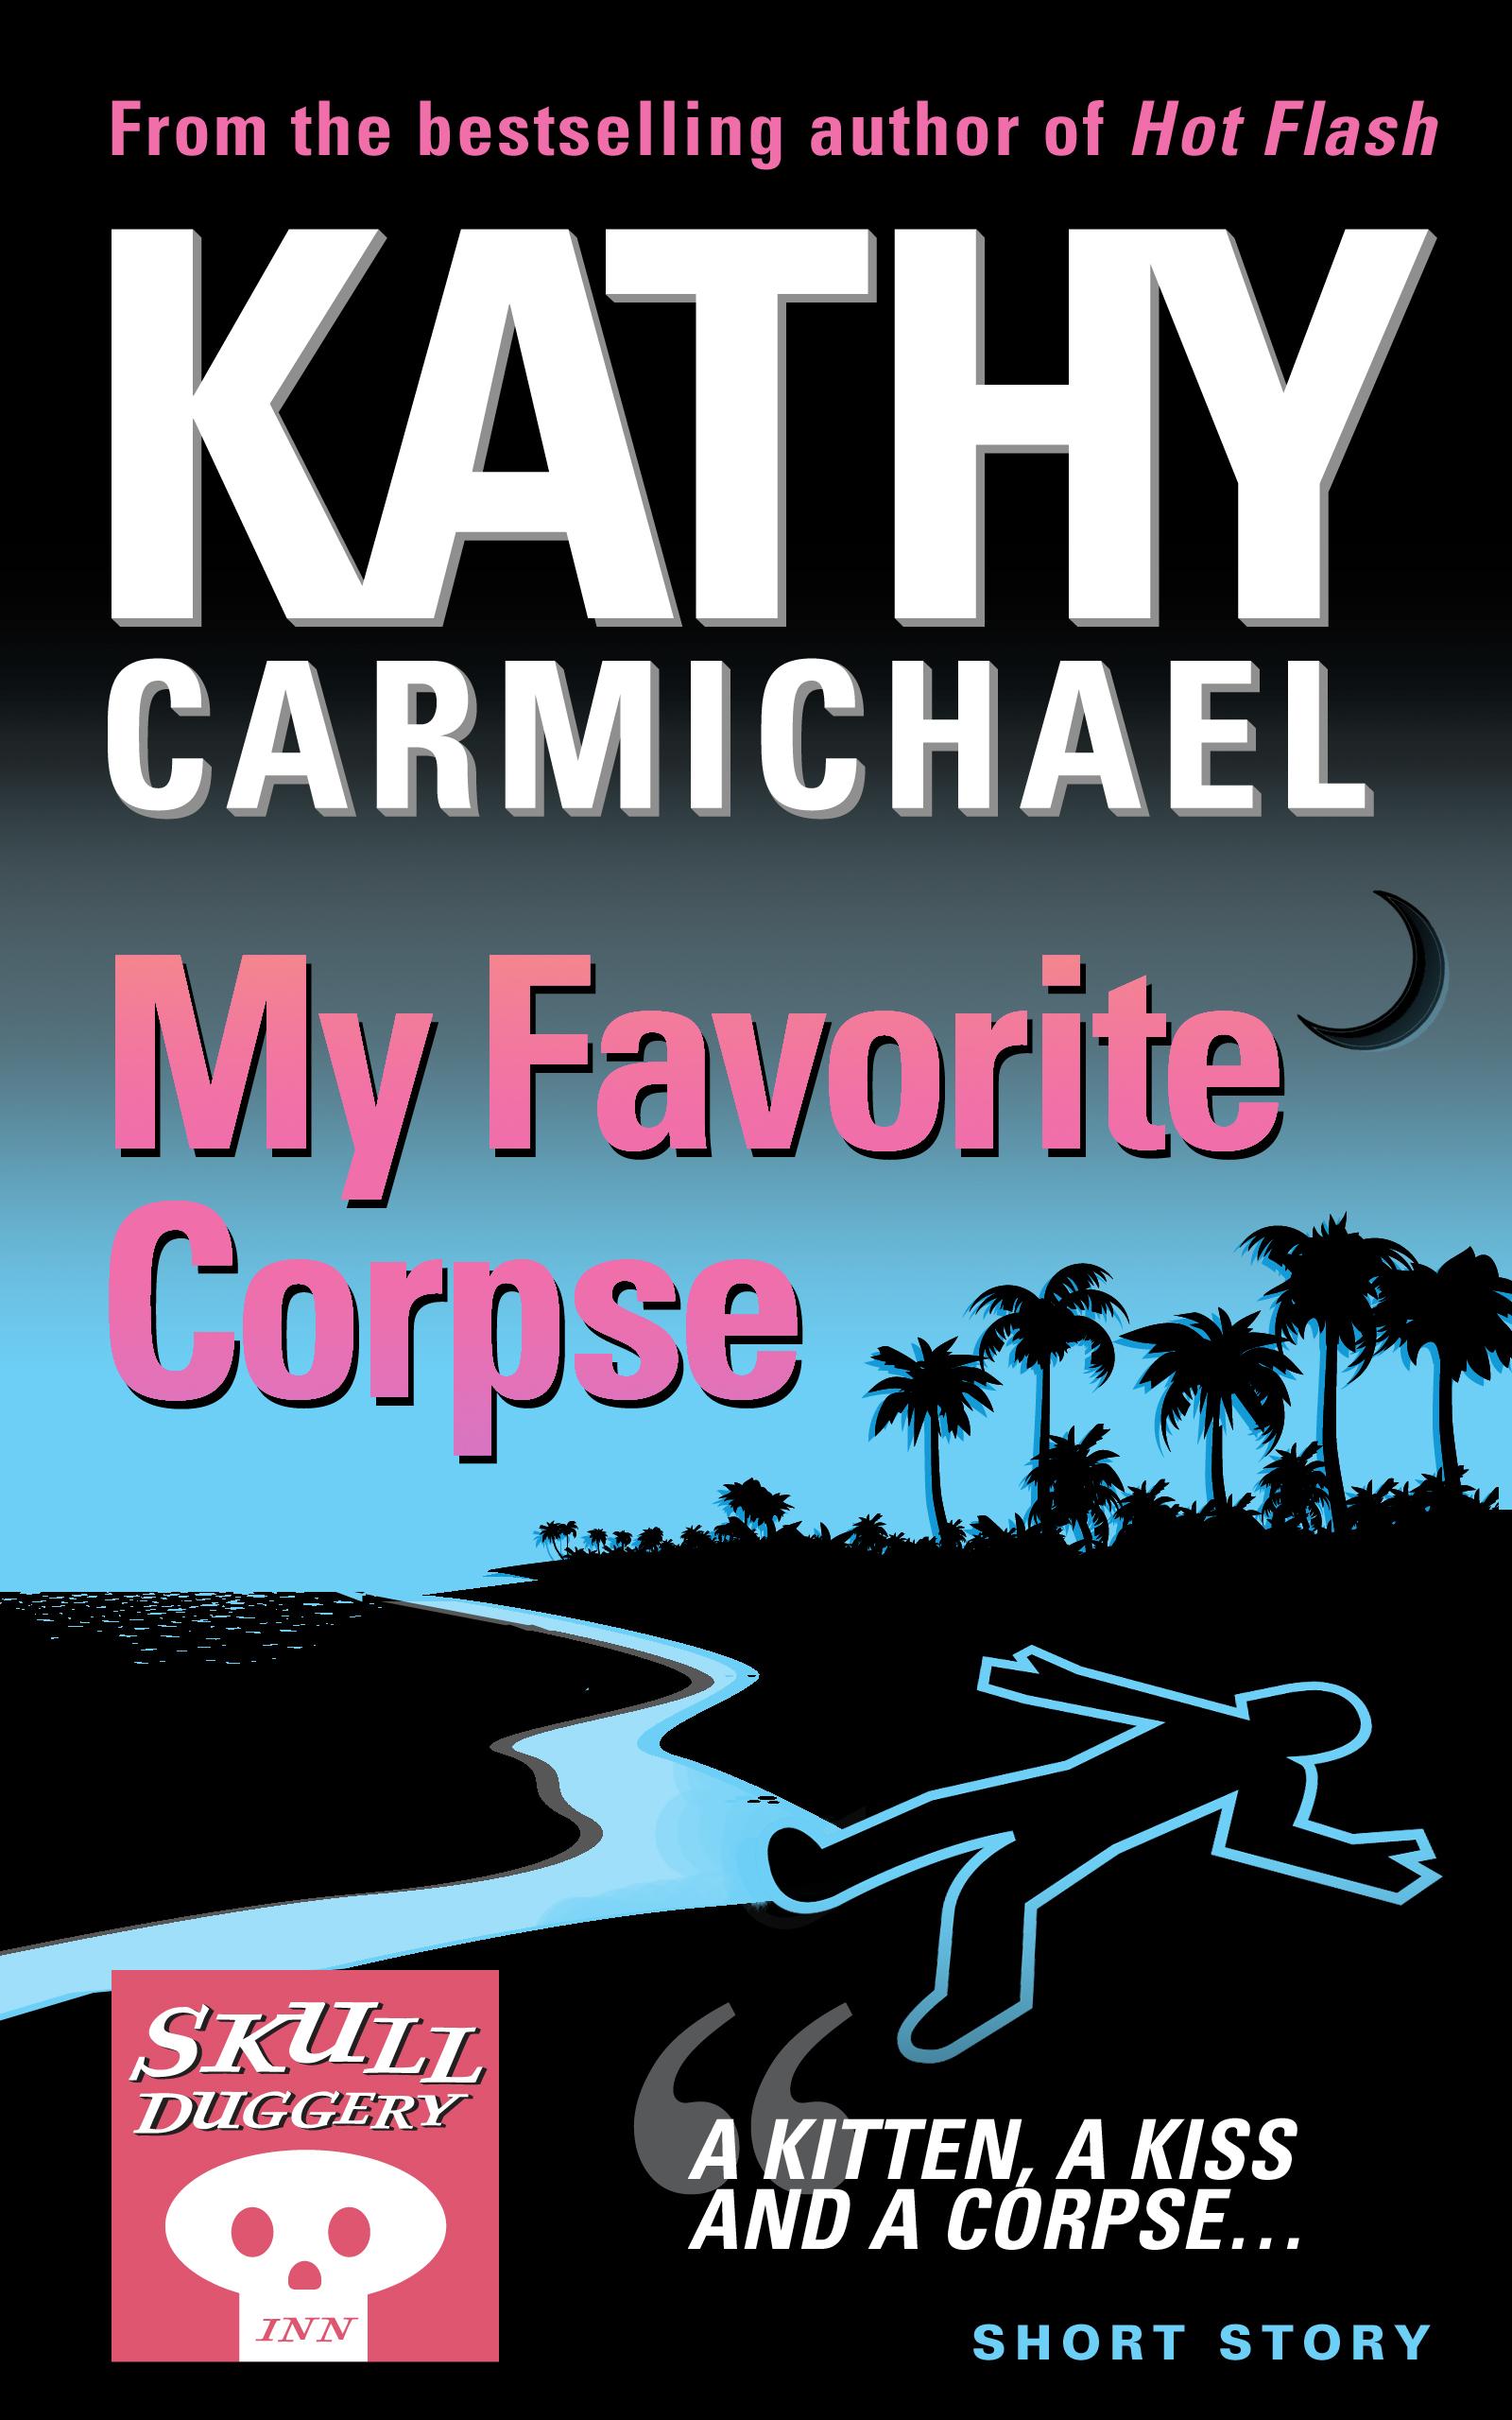 Kathy Carmichael - My Favorite Corpse (A Skullduggery Inn Short Story)